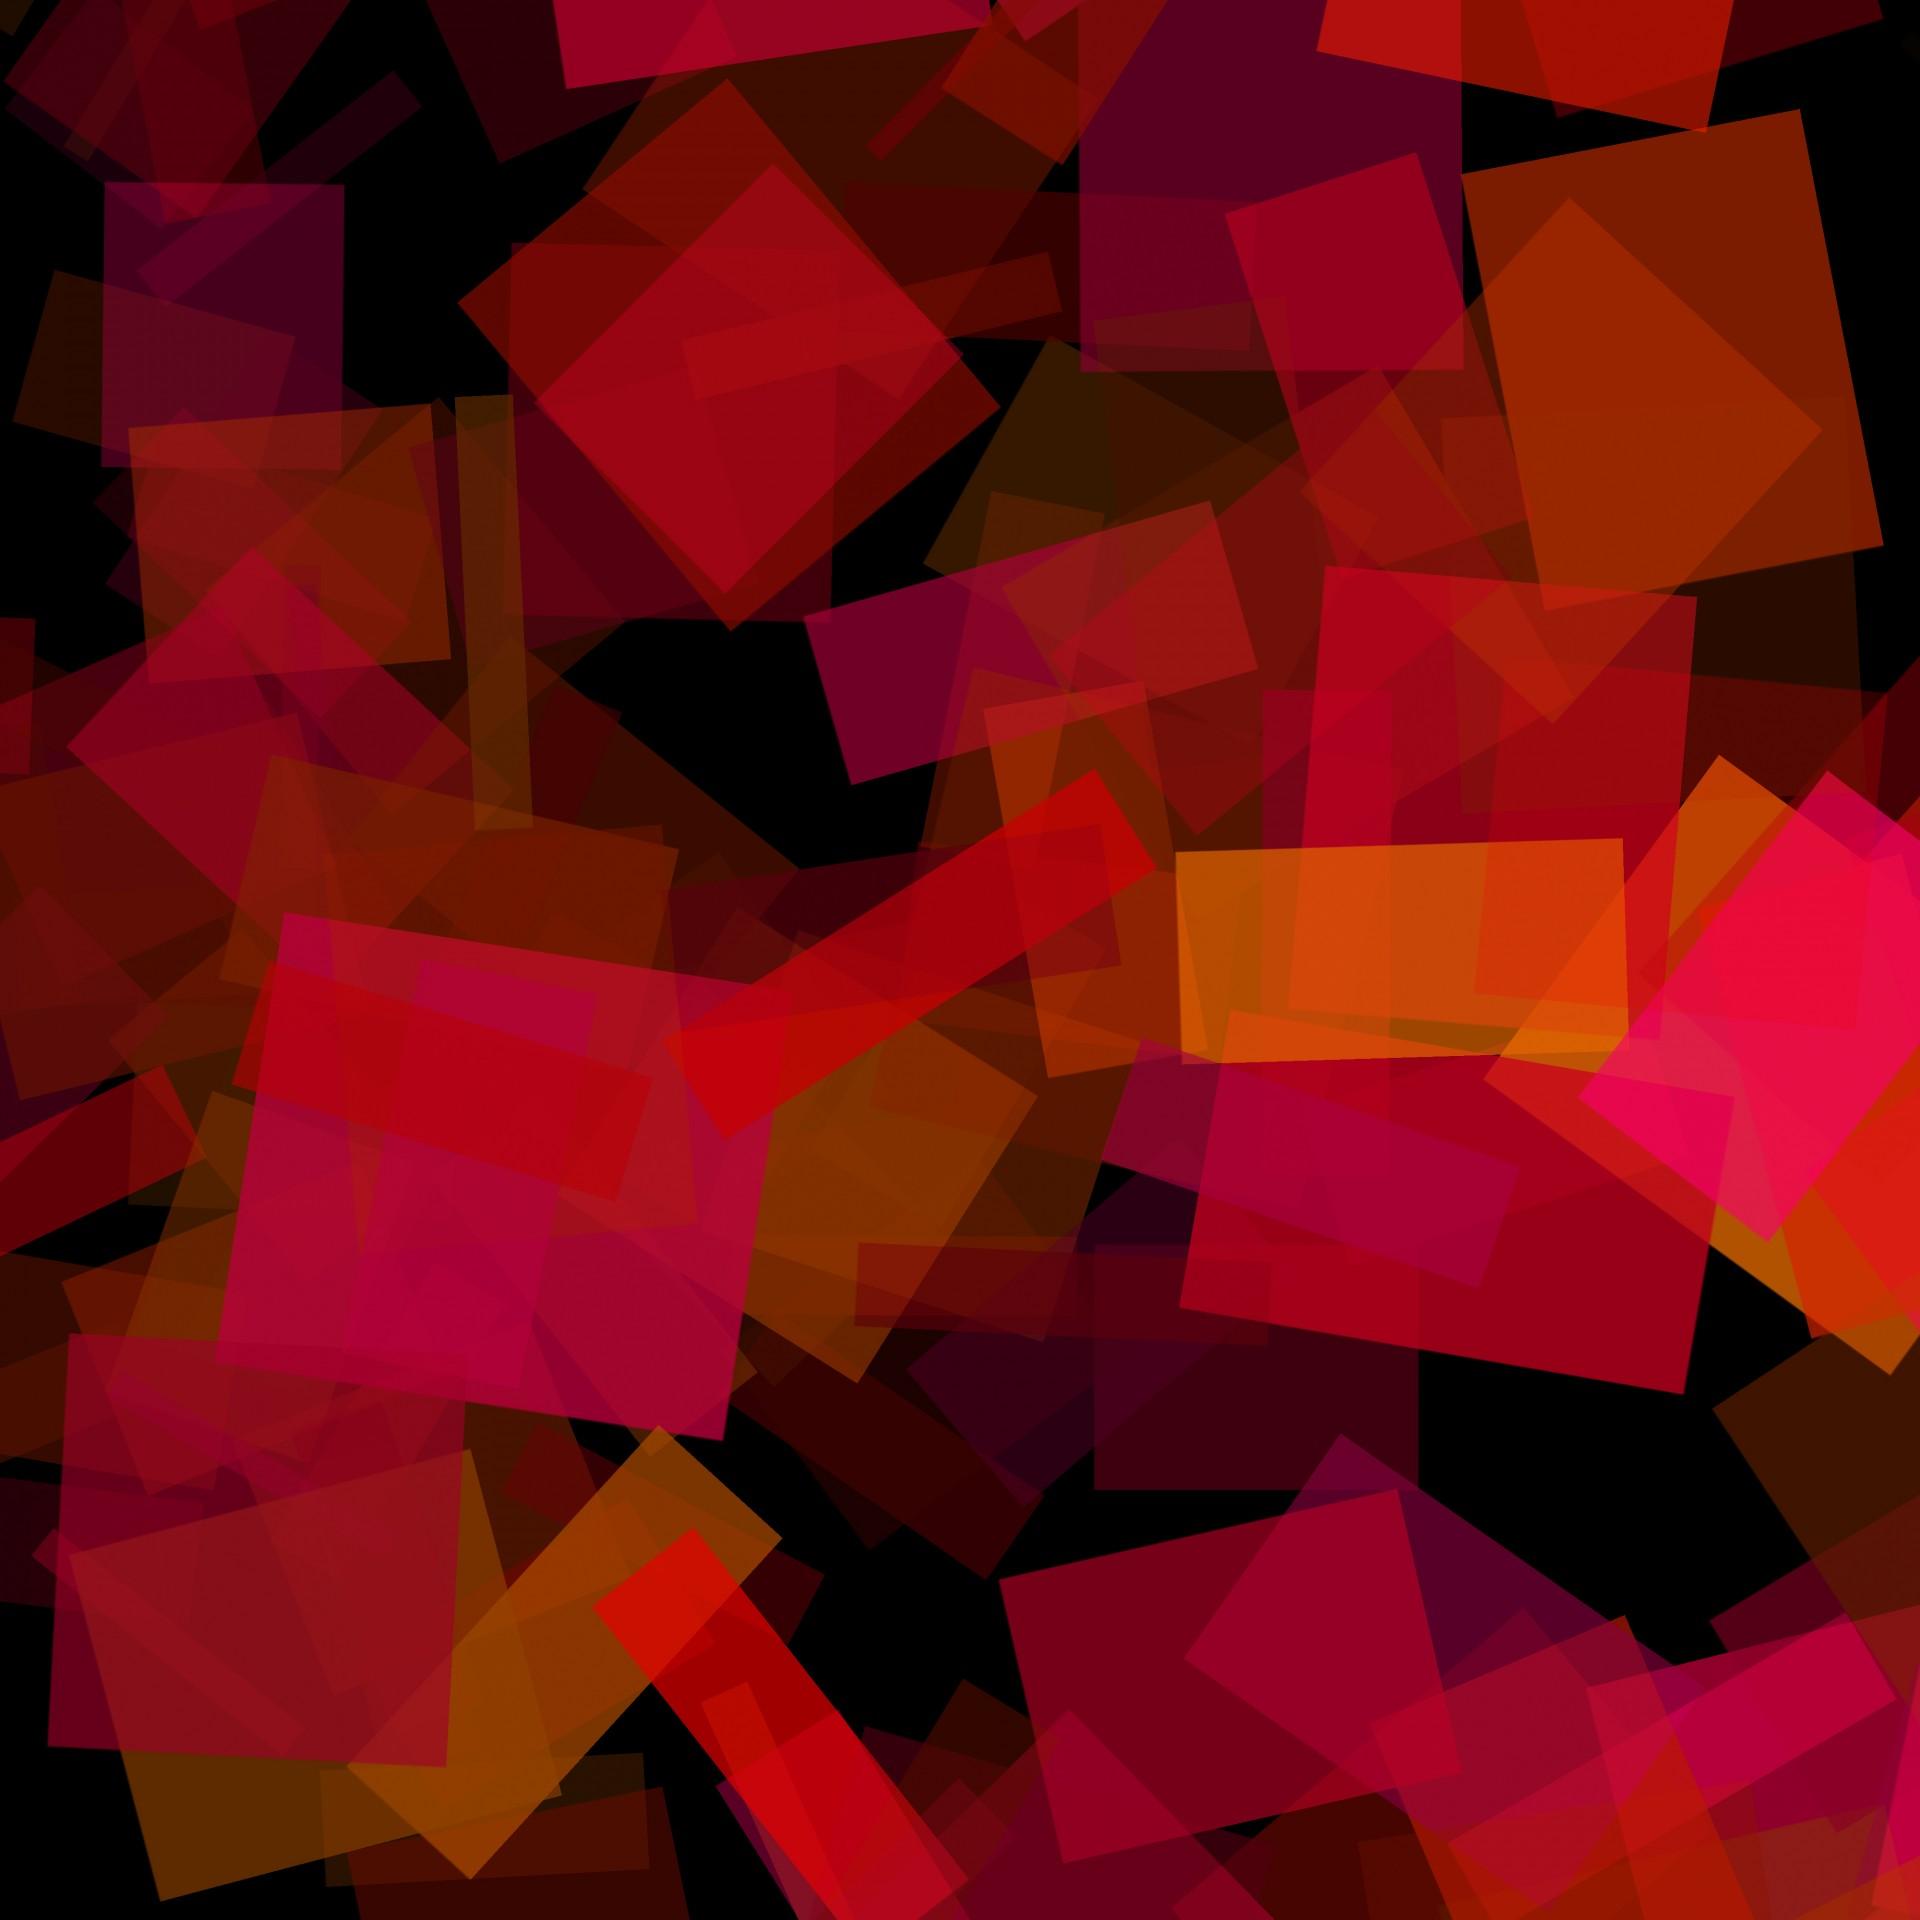 pink-rectangles.jpg